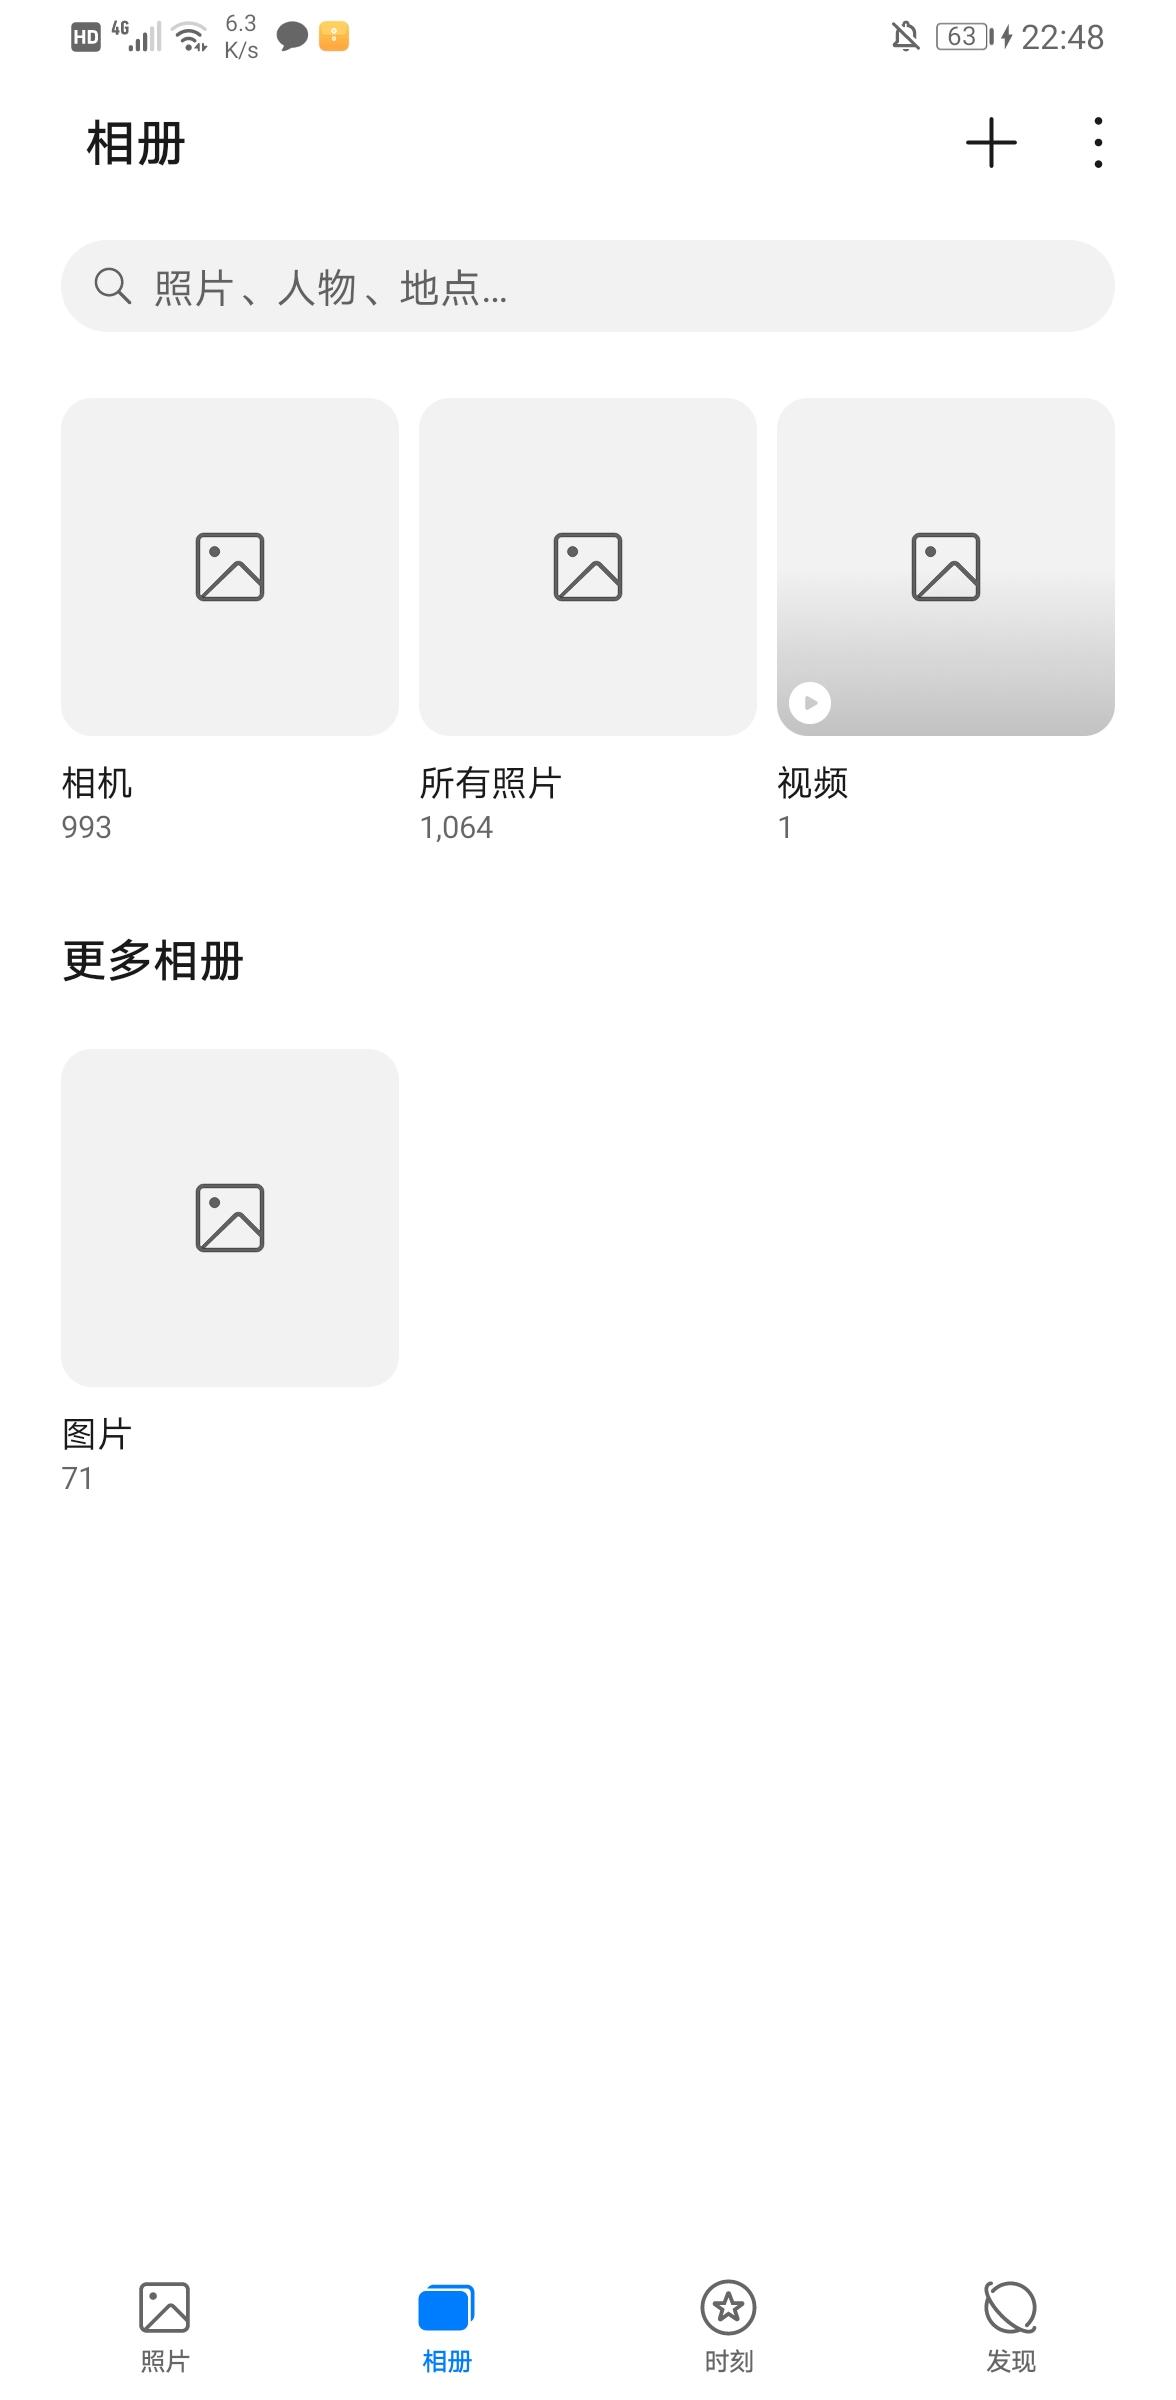 Screenshot_20210515_224802_com.android.gallery3d.jpg